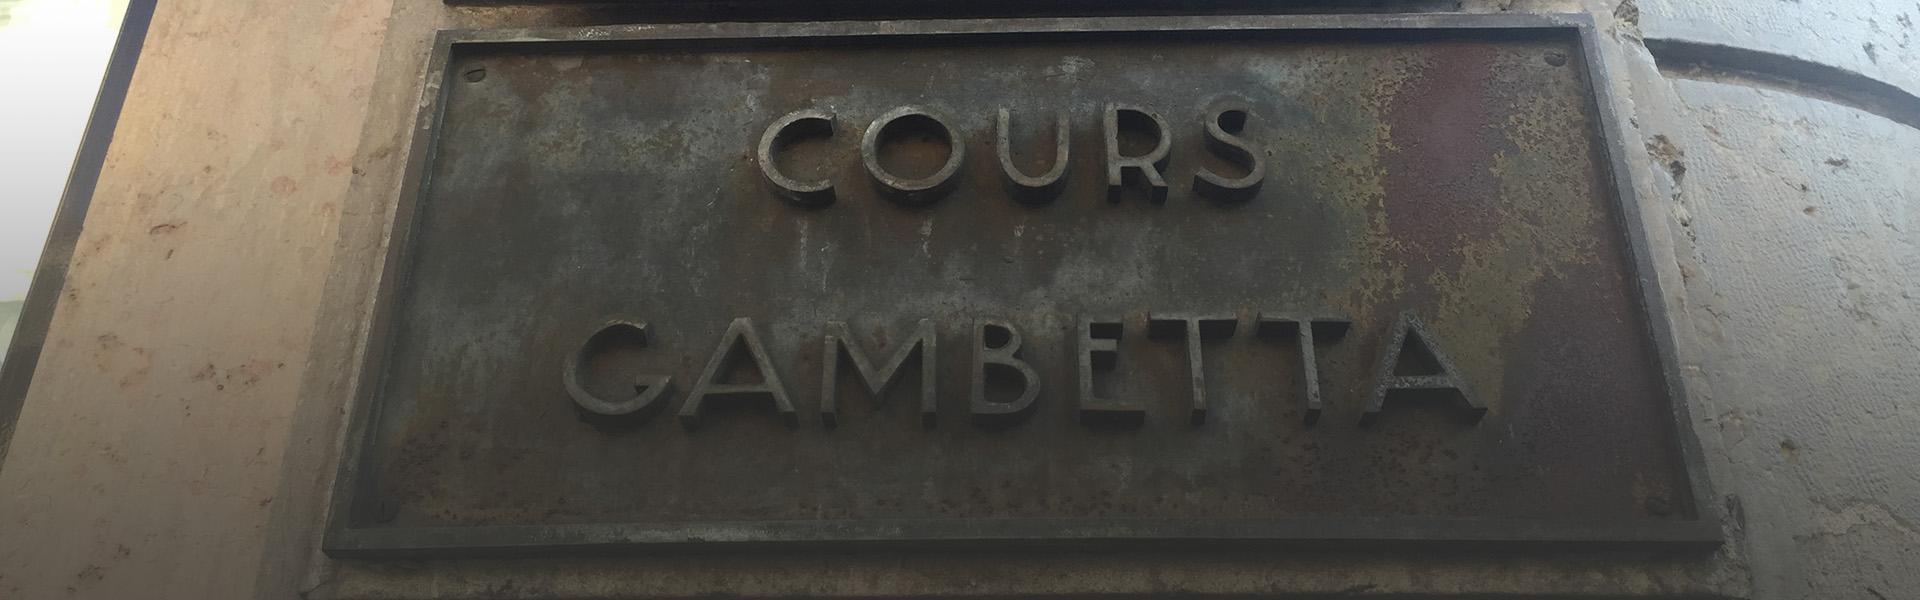 Louer un bureau à Saxe-Gambetta, Lyon